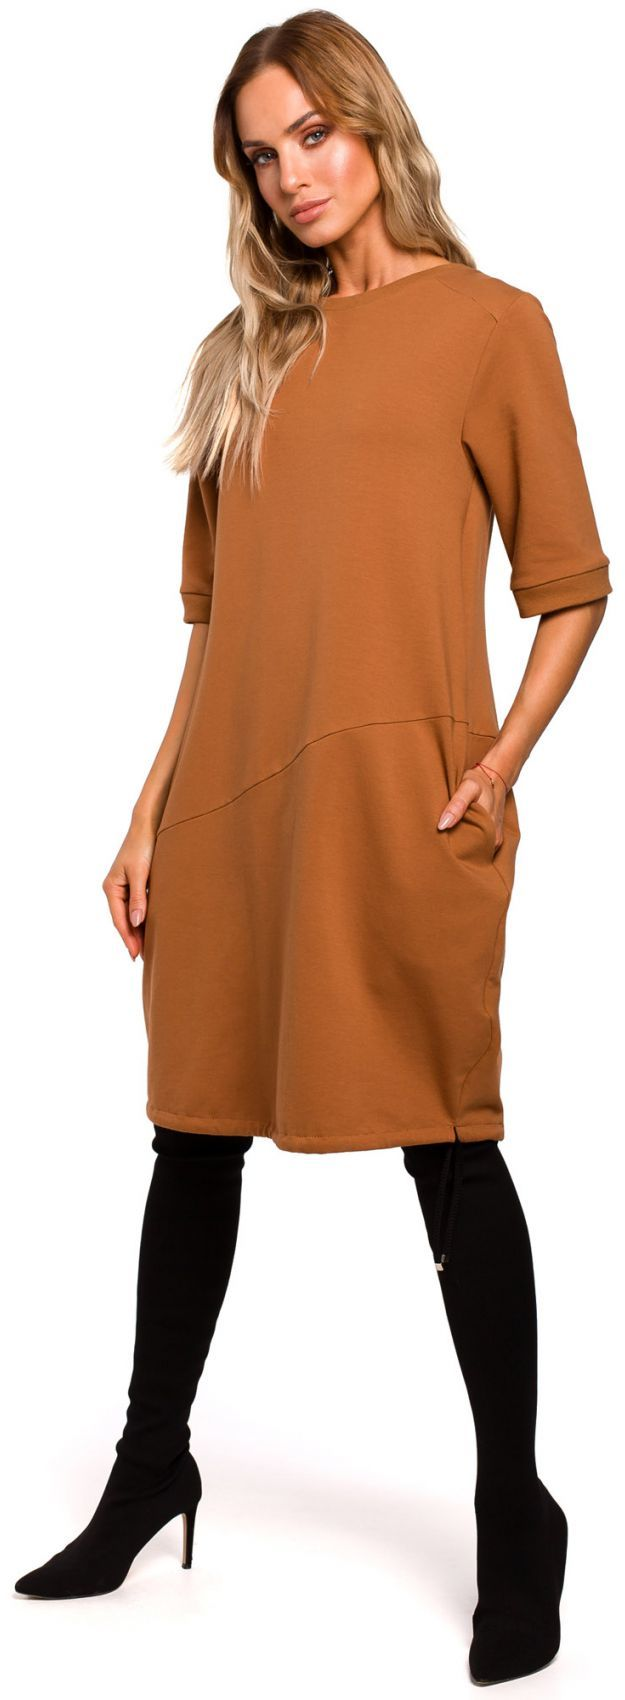 M451 Sukienka bombka - karmelowa